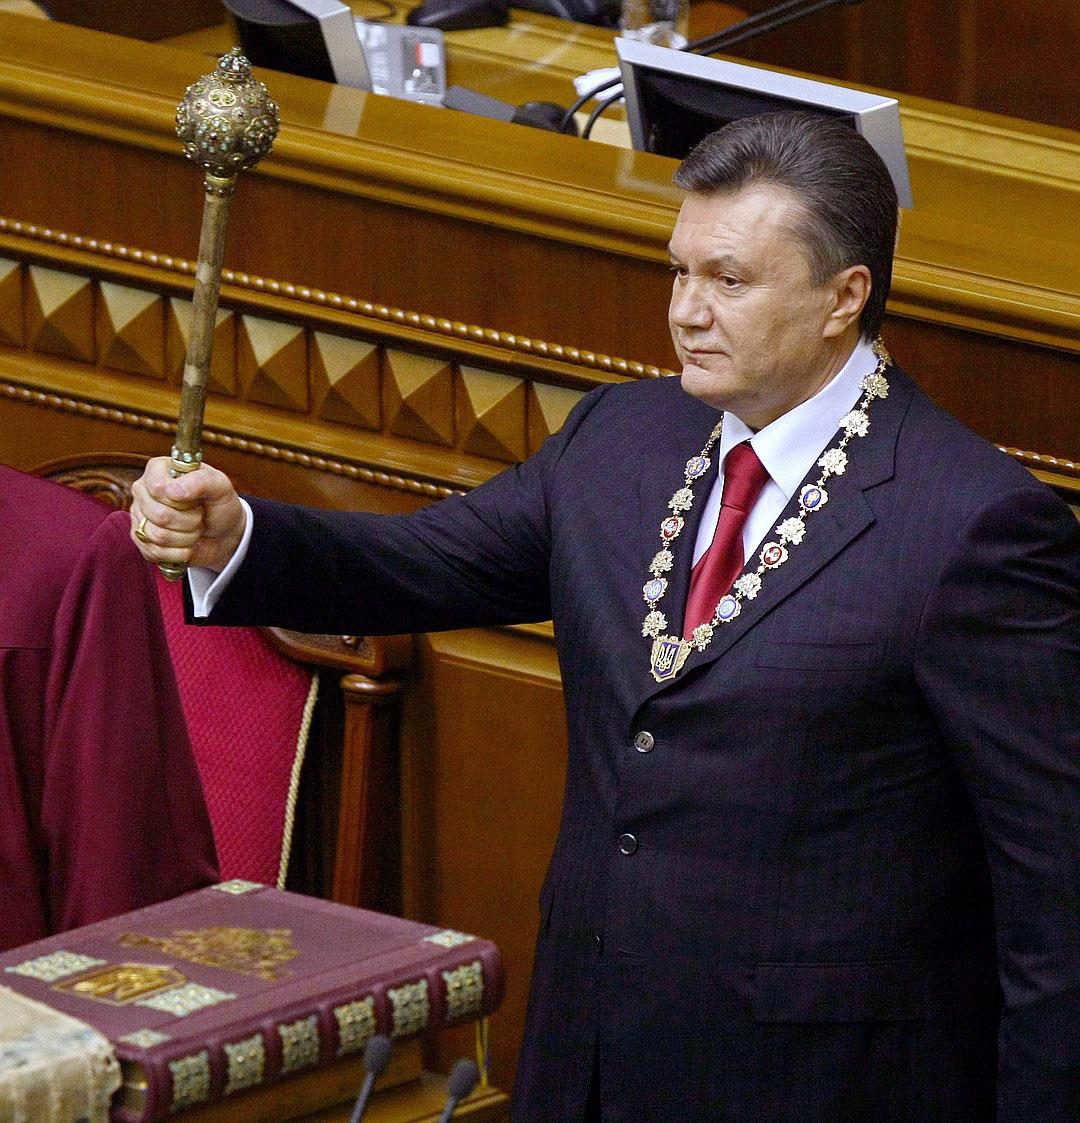 Став президентом, Янукович оказался не на своём месте.